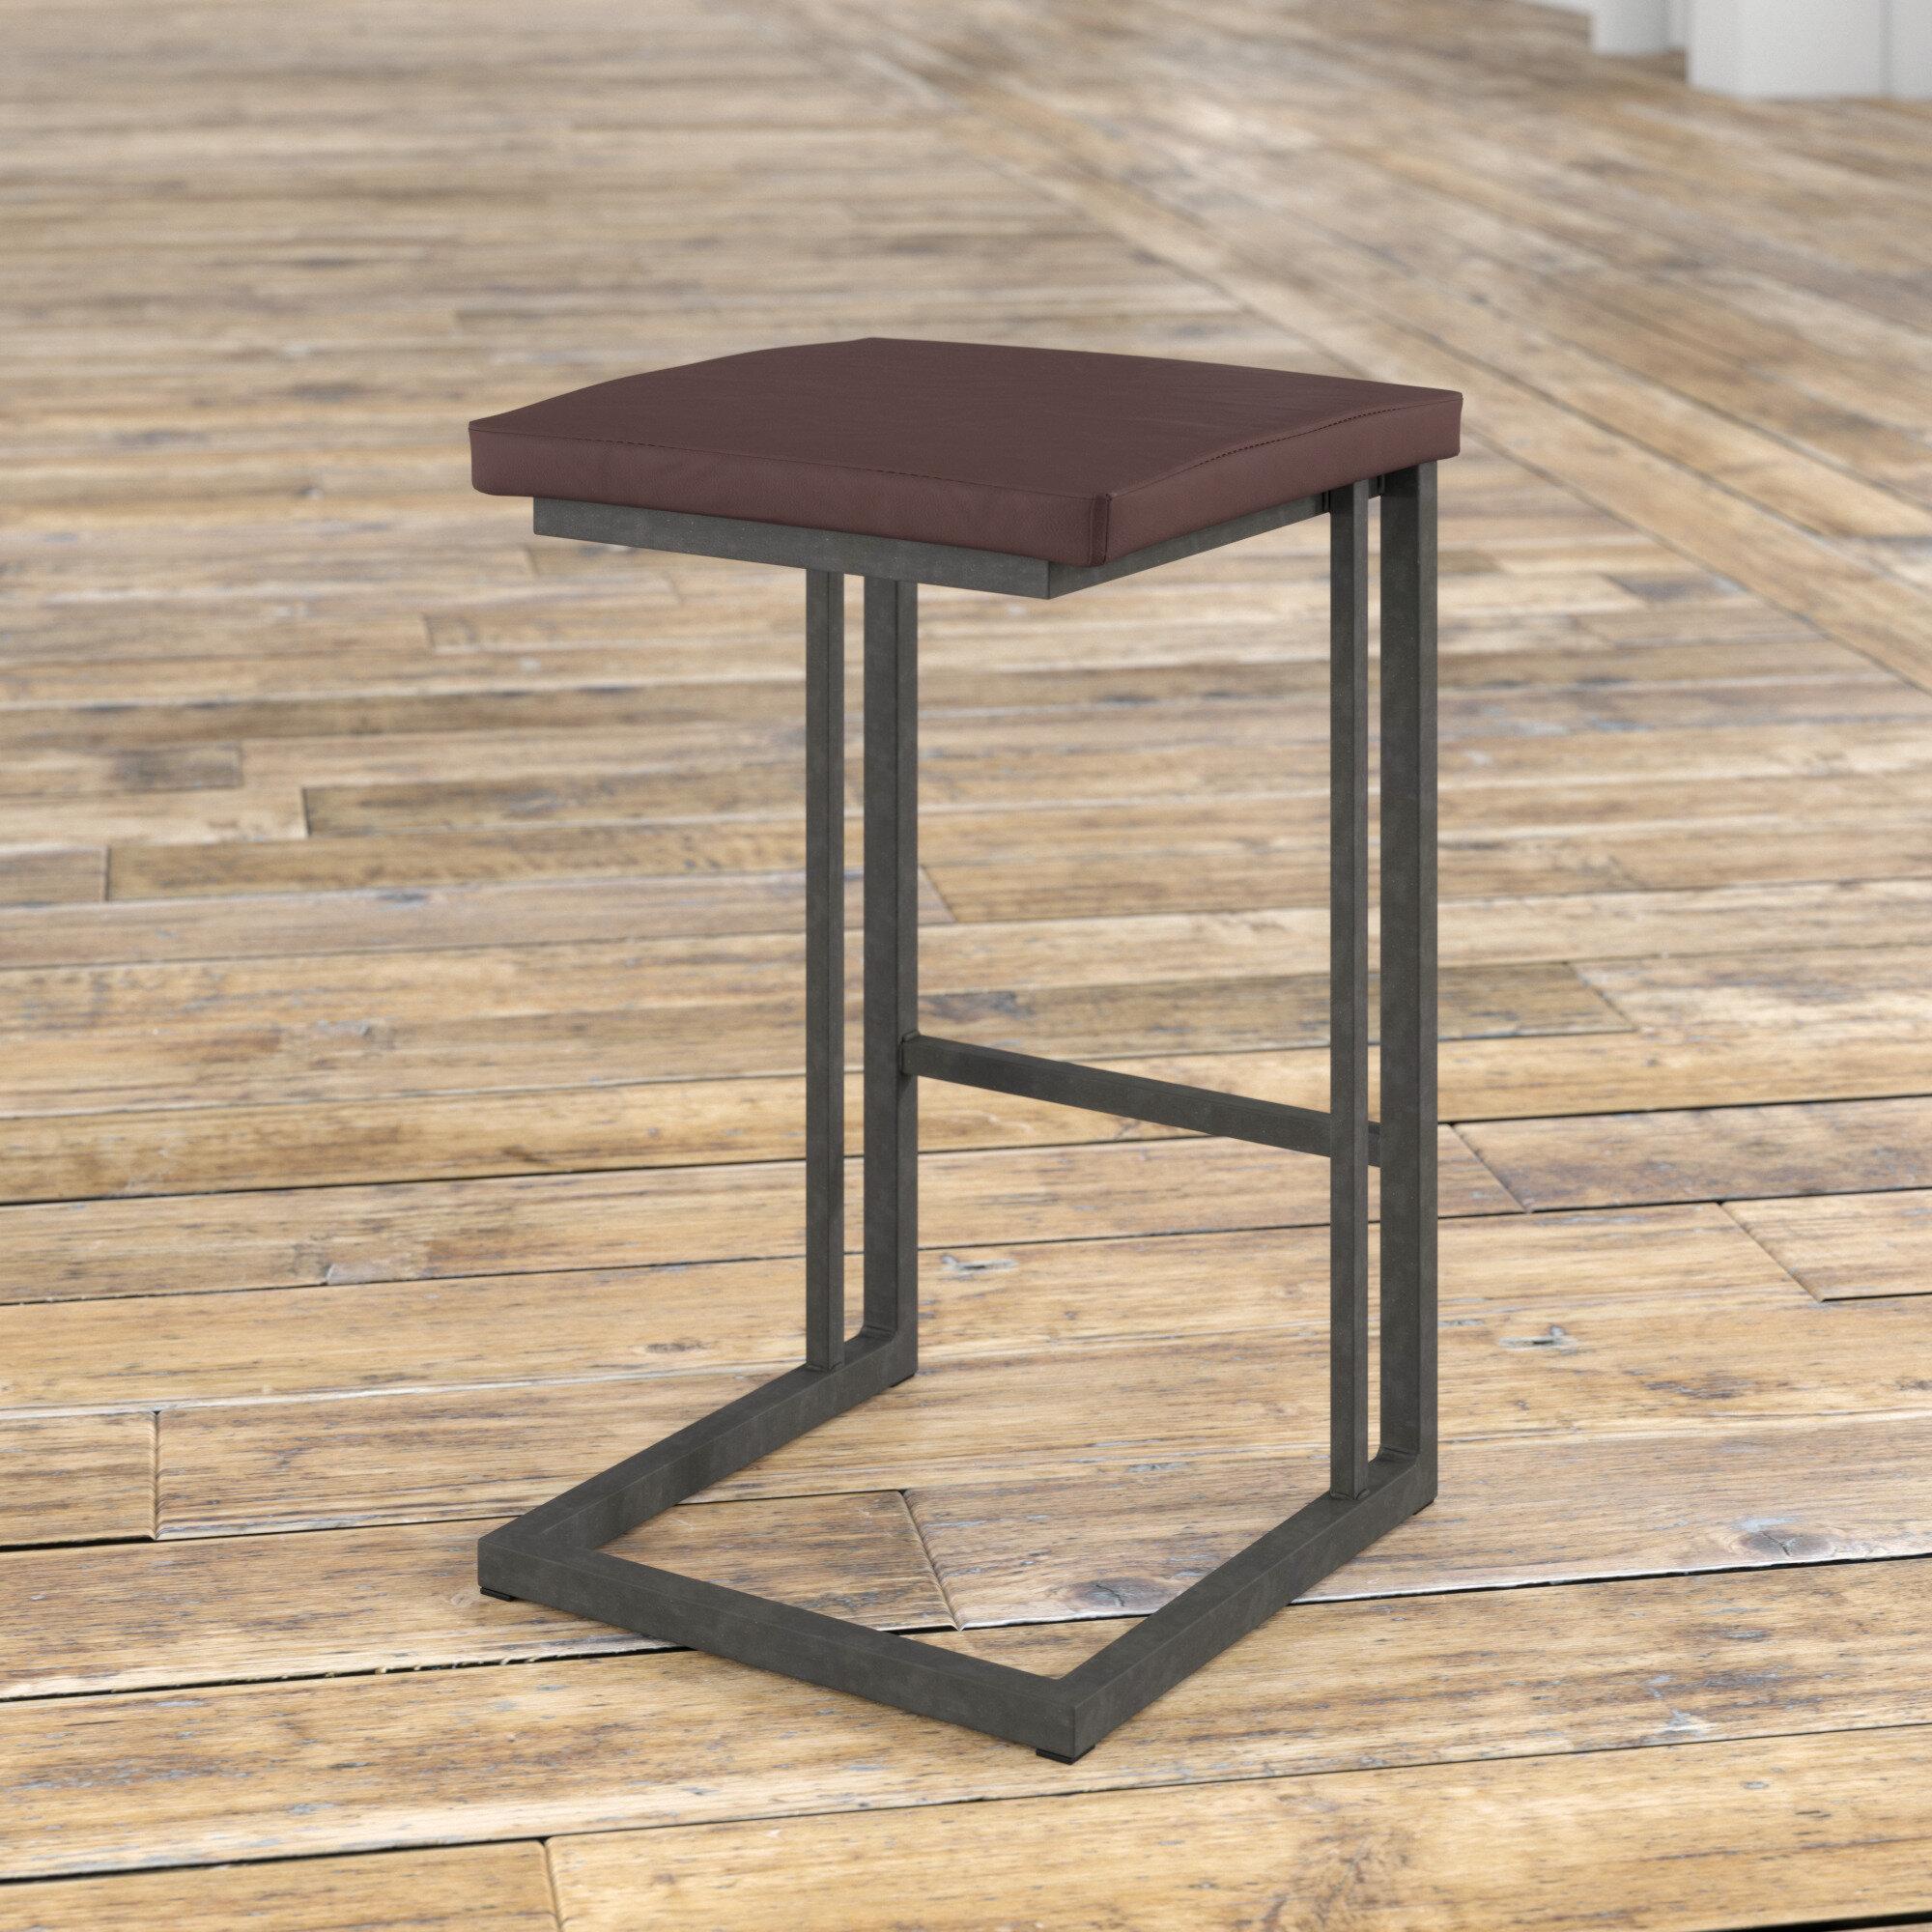 Terrific Trent Austin Design Calistoga 25 75 Bar Stool Reviews Forskolin Free Trial Chair Design Images Forskolin Free Trialorg